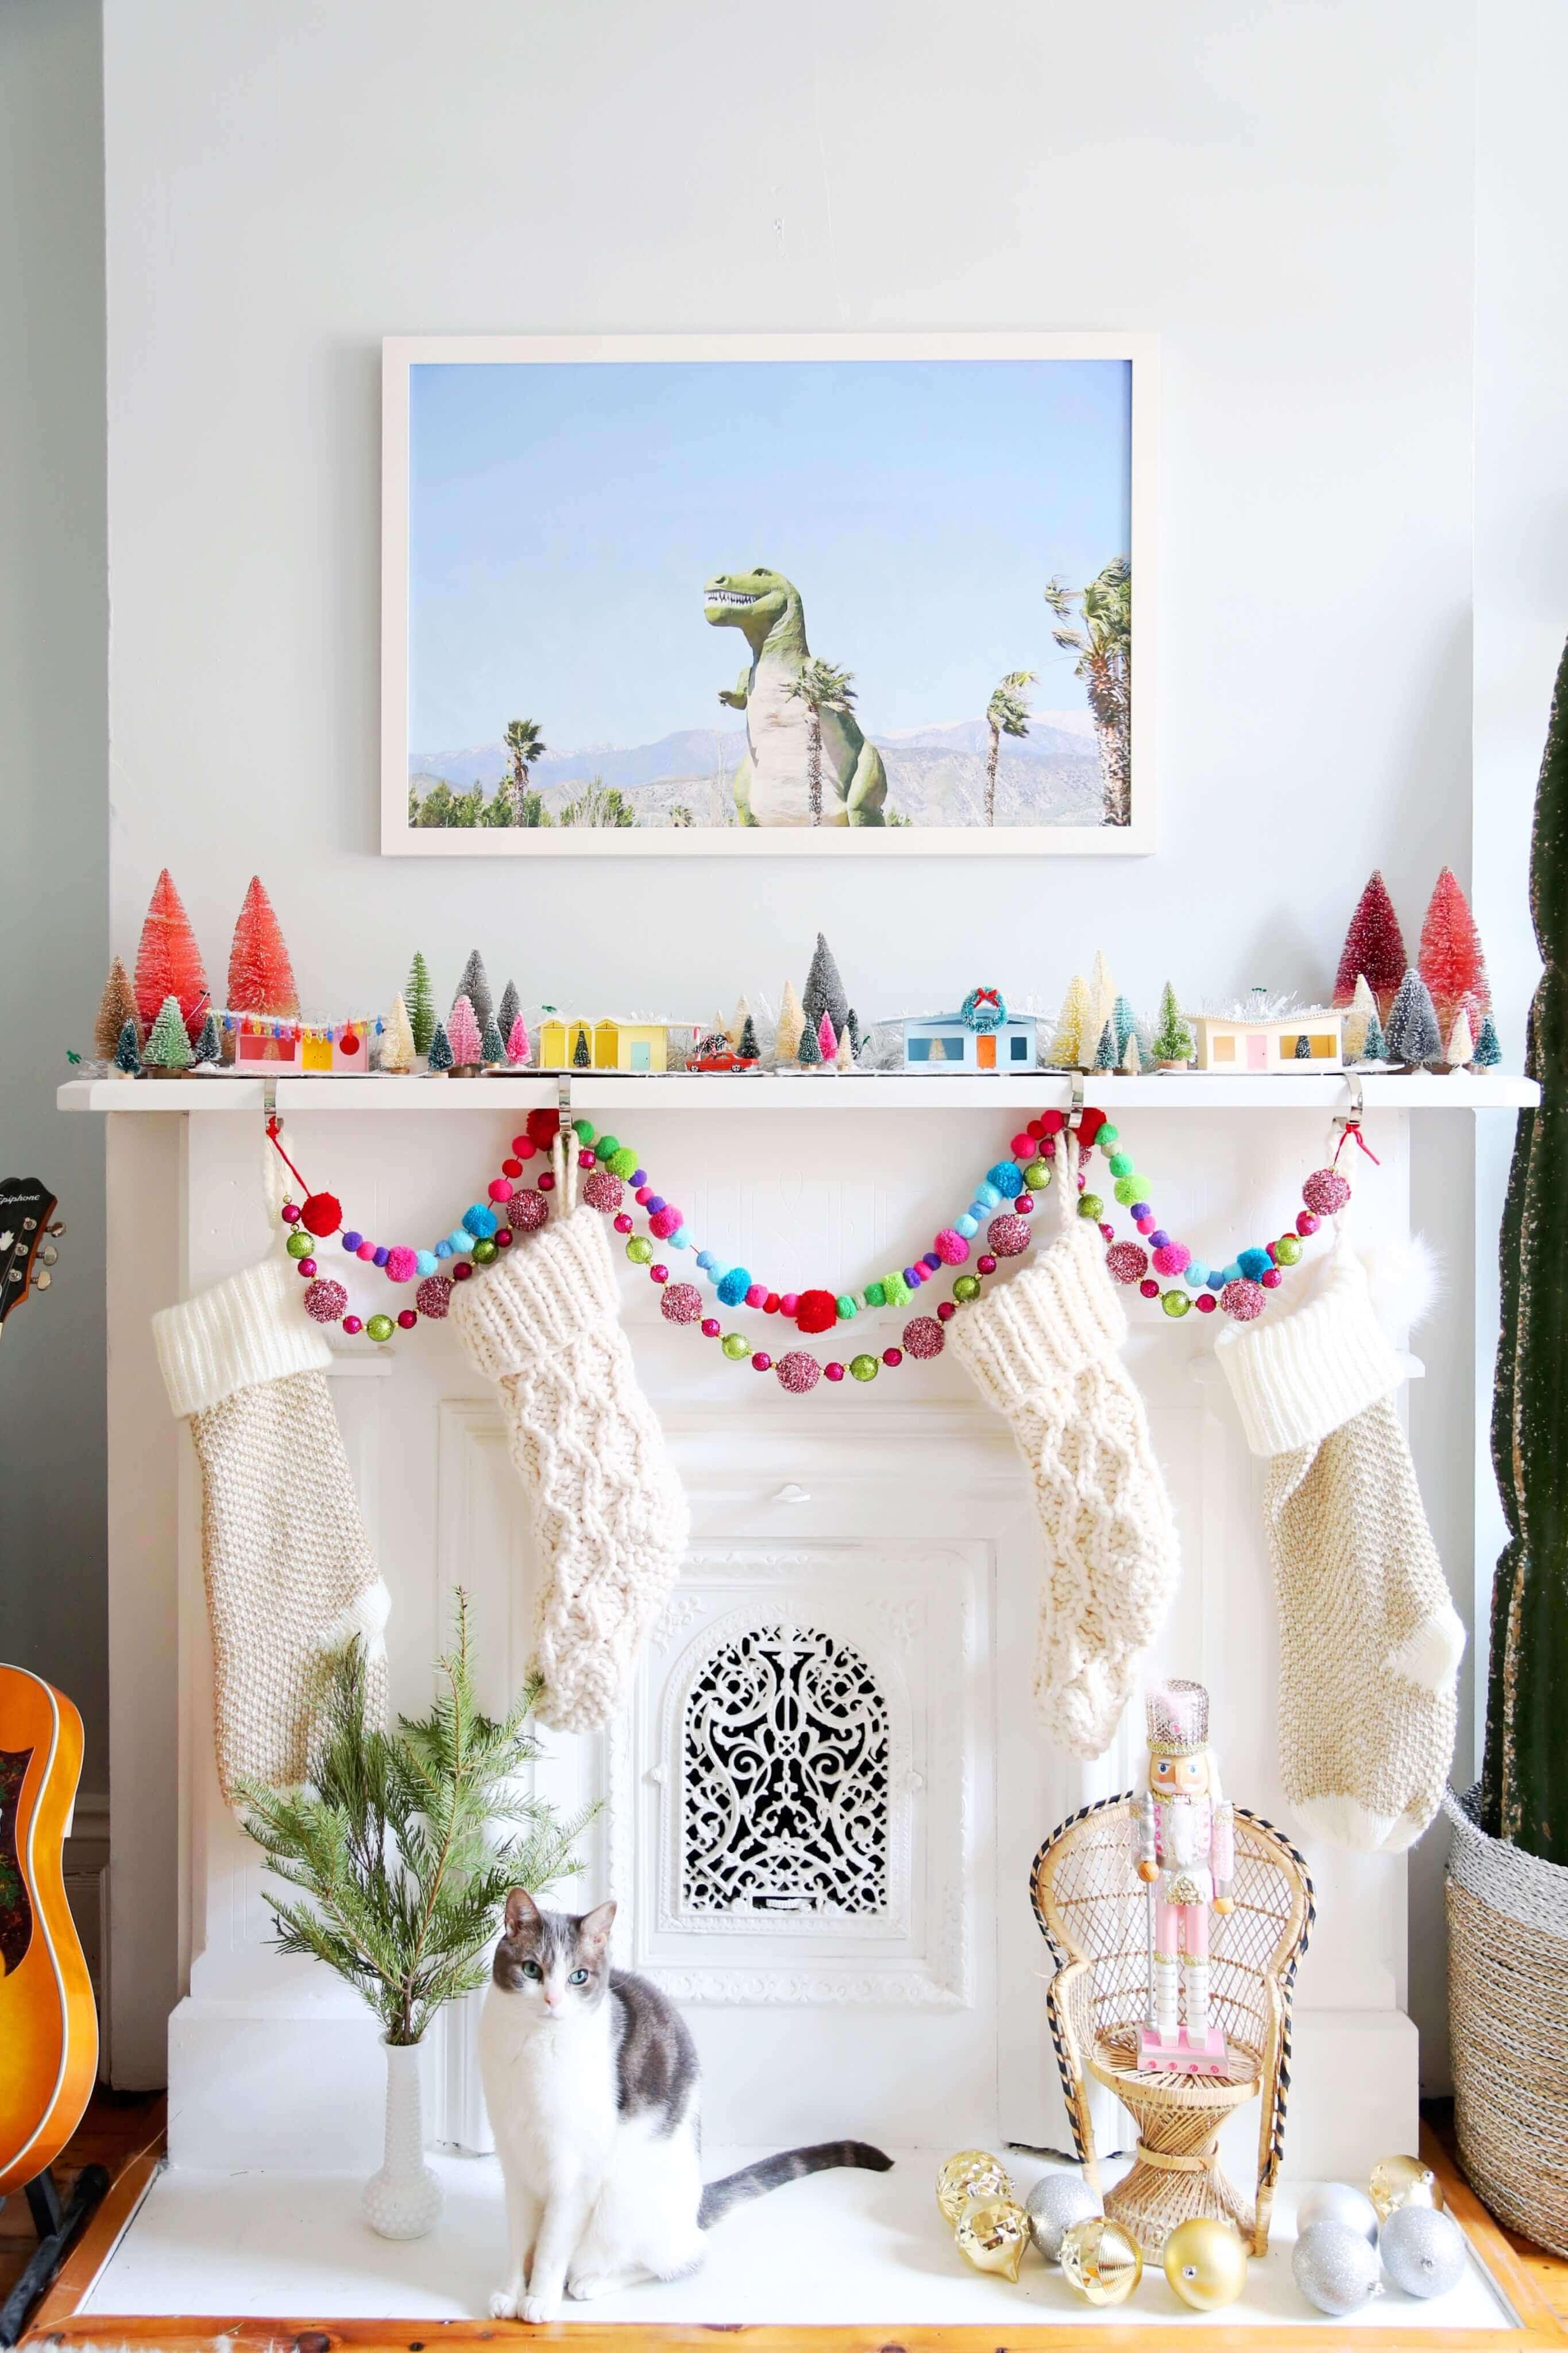 colorful retro Christmas village mantel